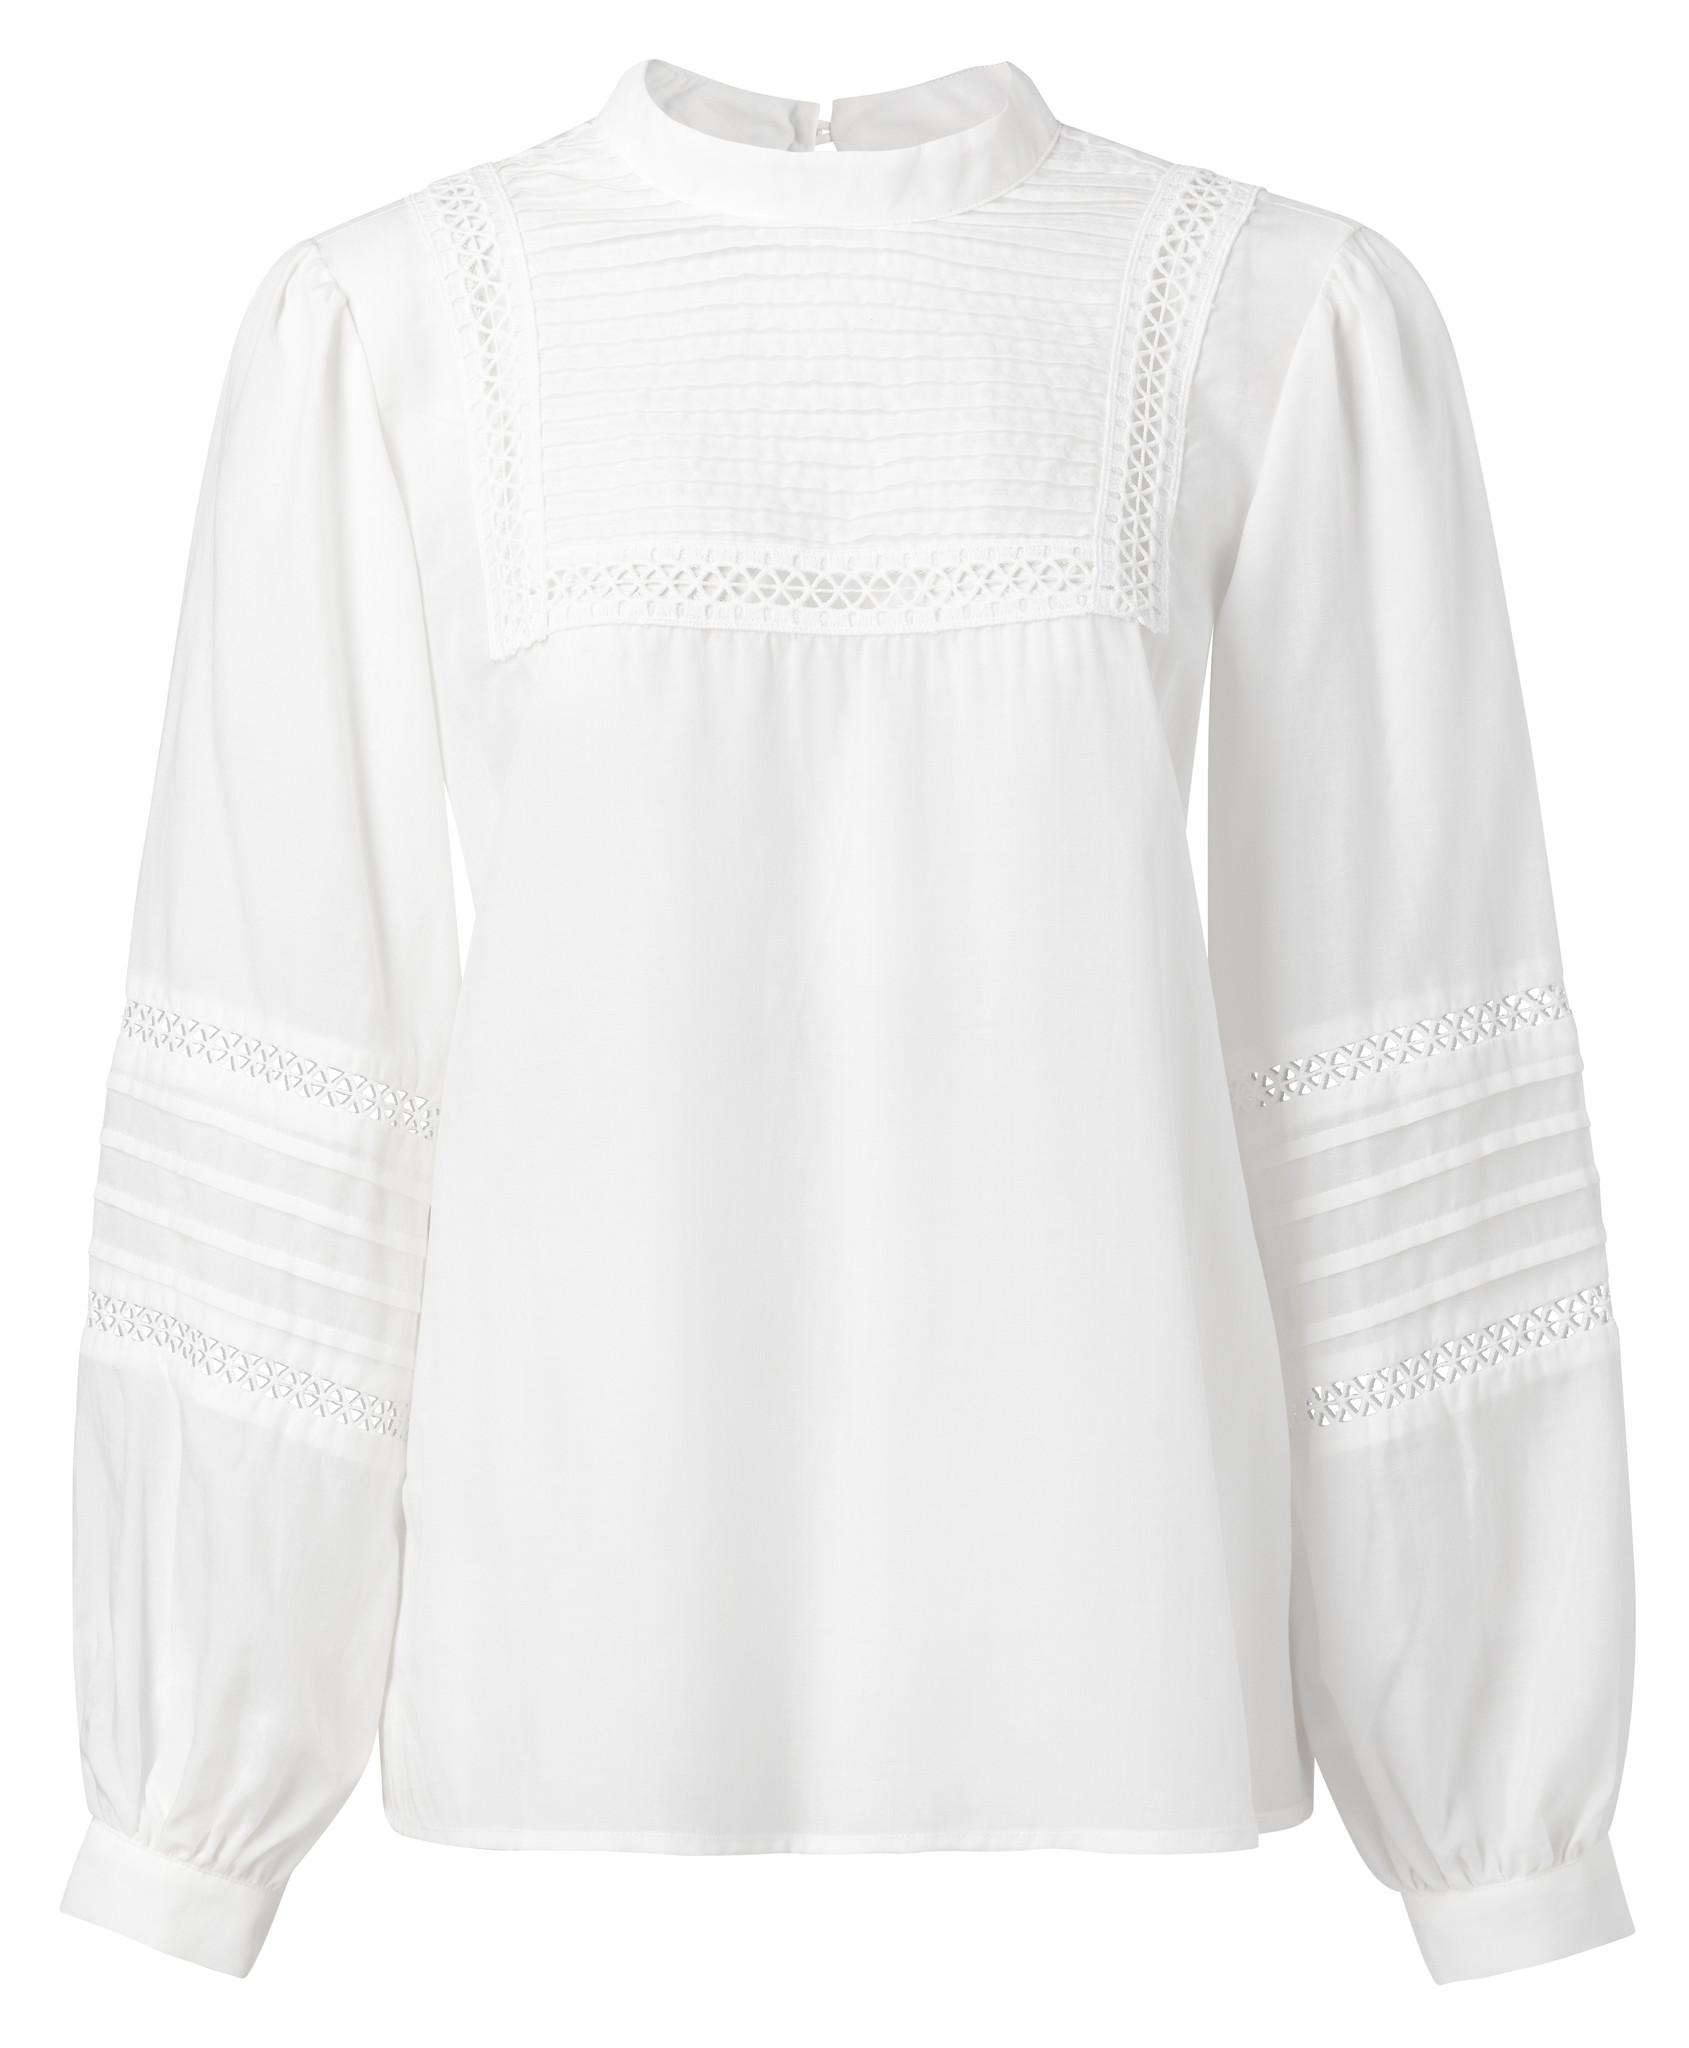 yaya Shirt with embroider 1101160-014-1